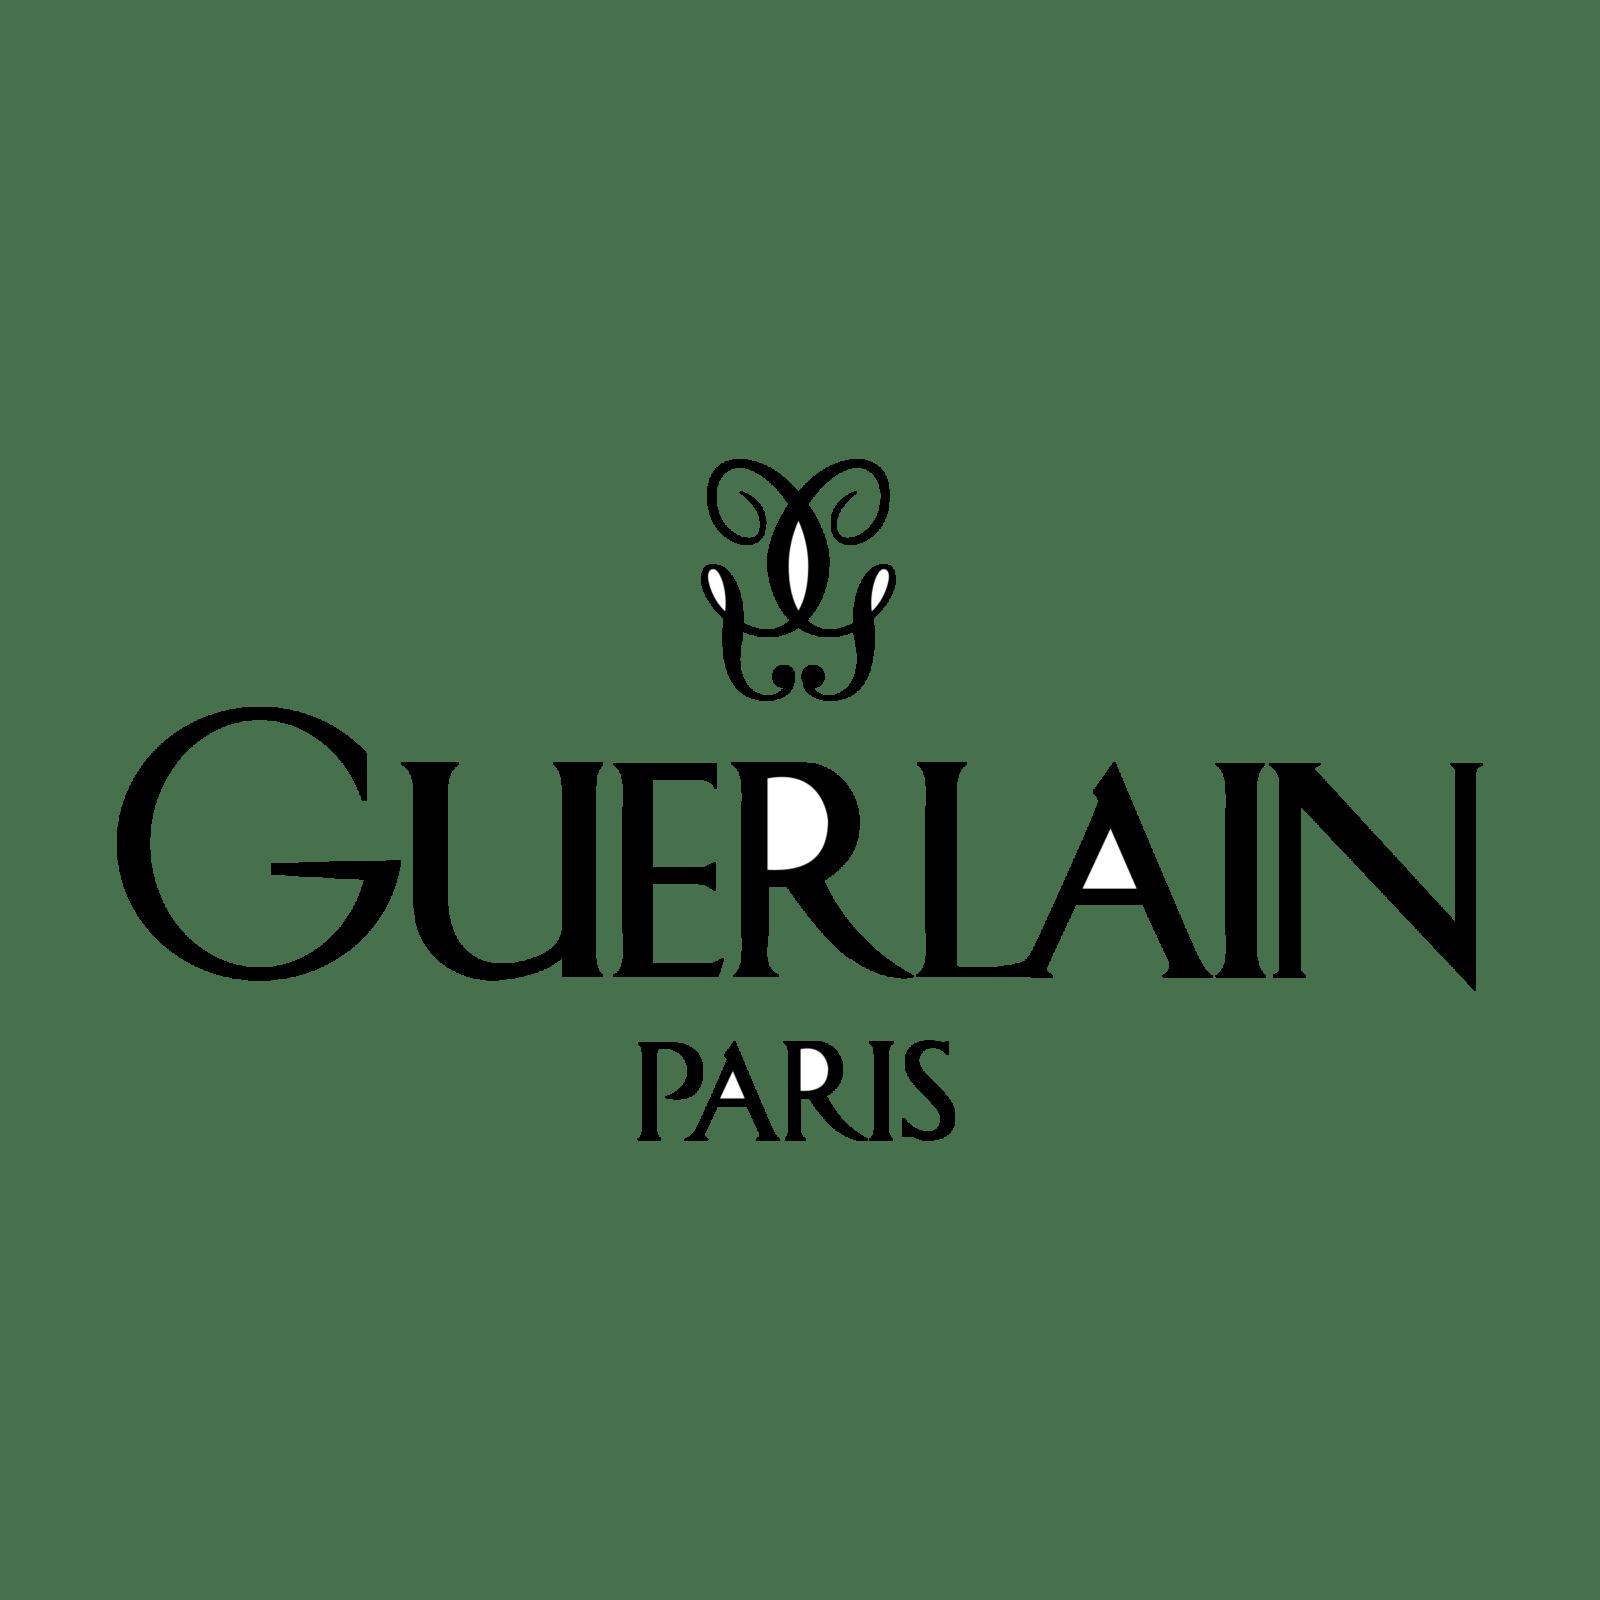 guerlain-logo-png-transparent